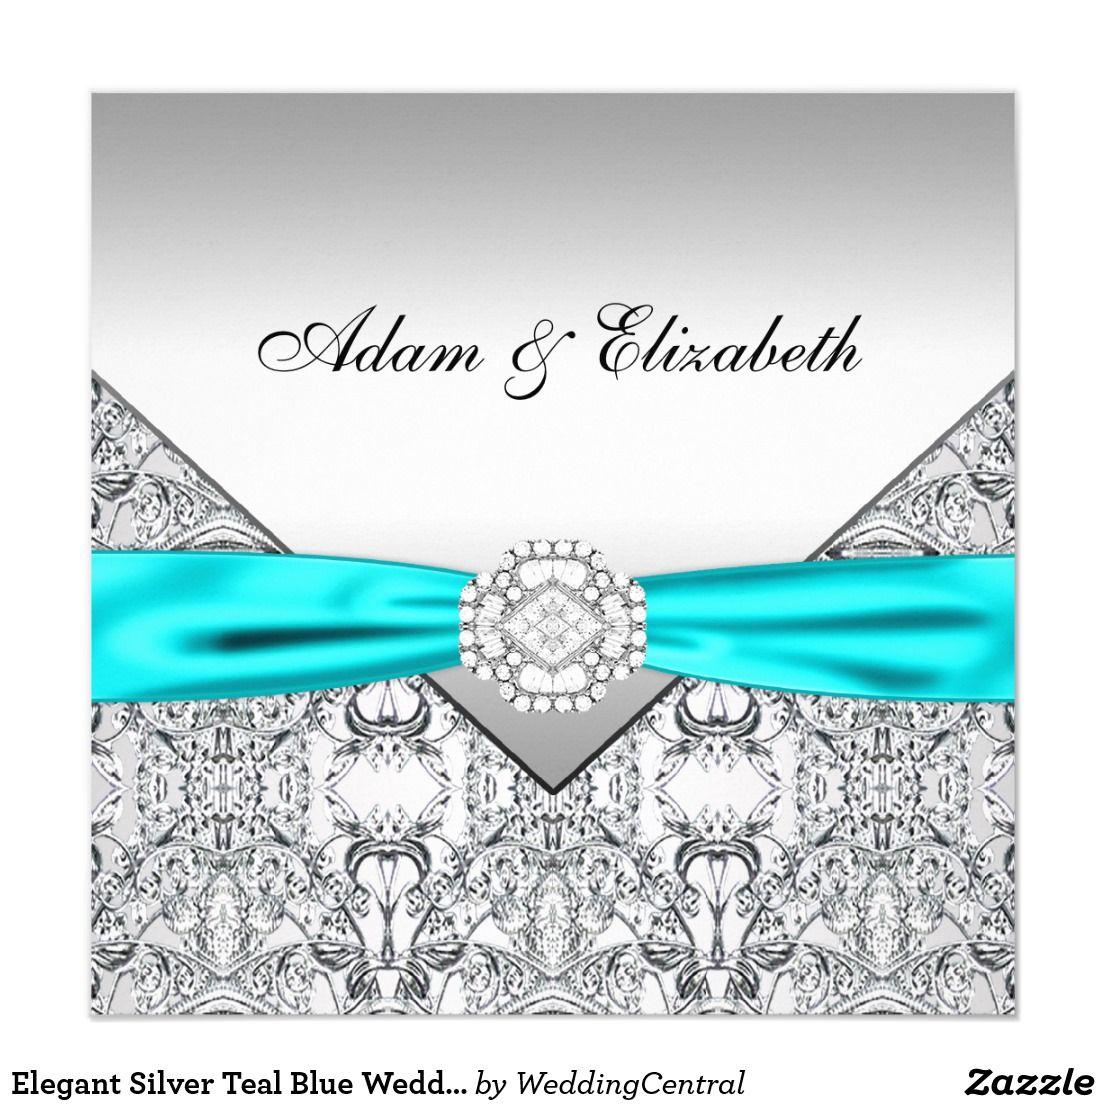 Elegant Silver Teal Blue Wedding Invitations | Invitations ...